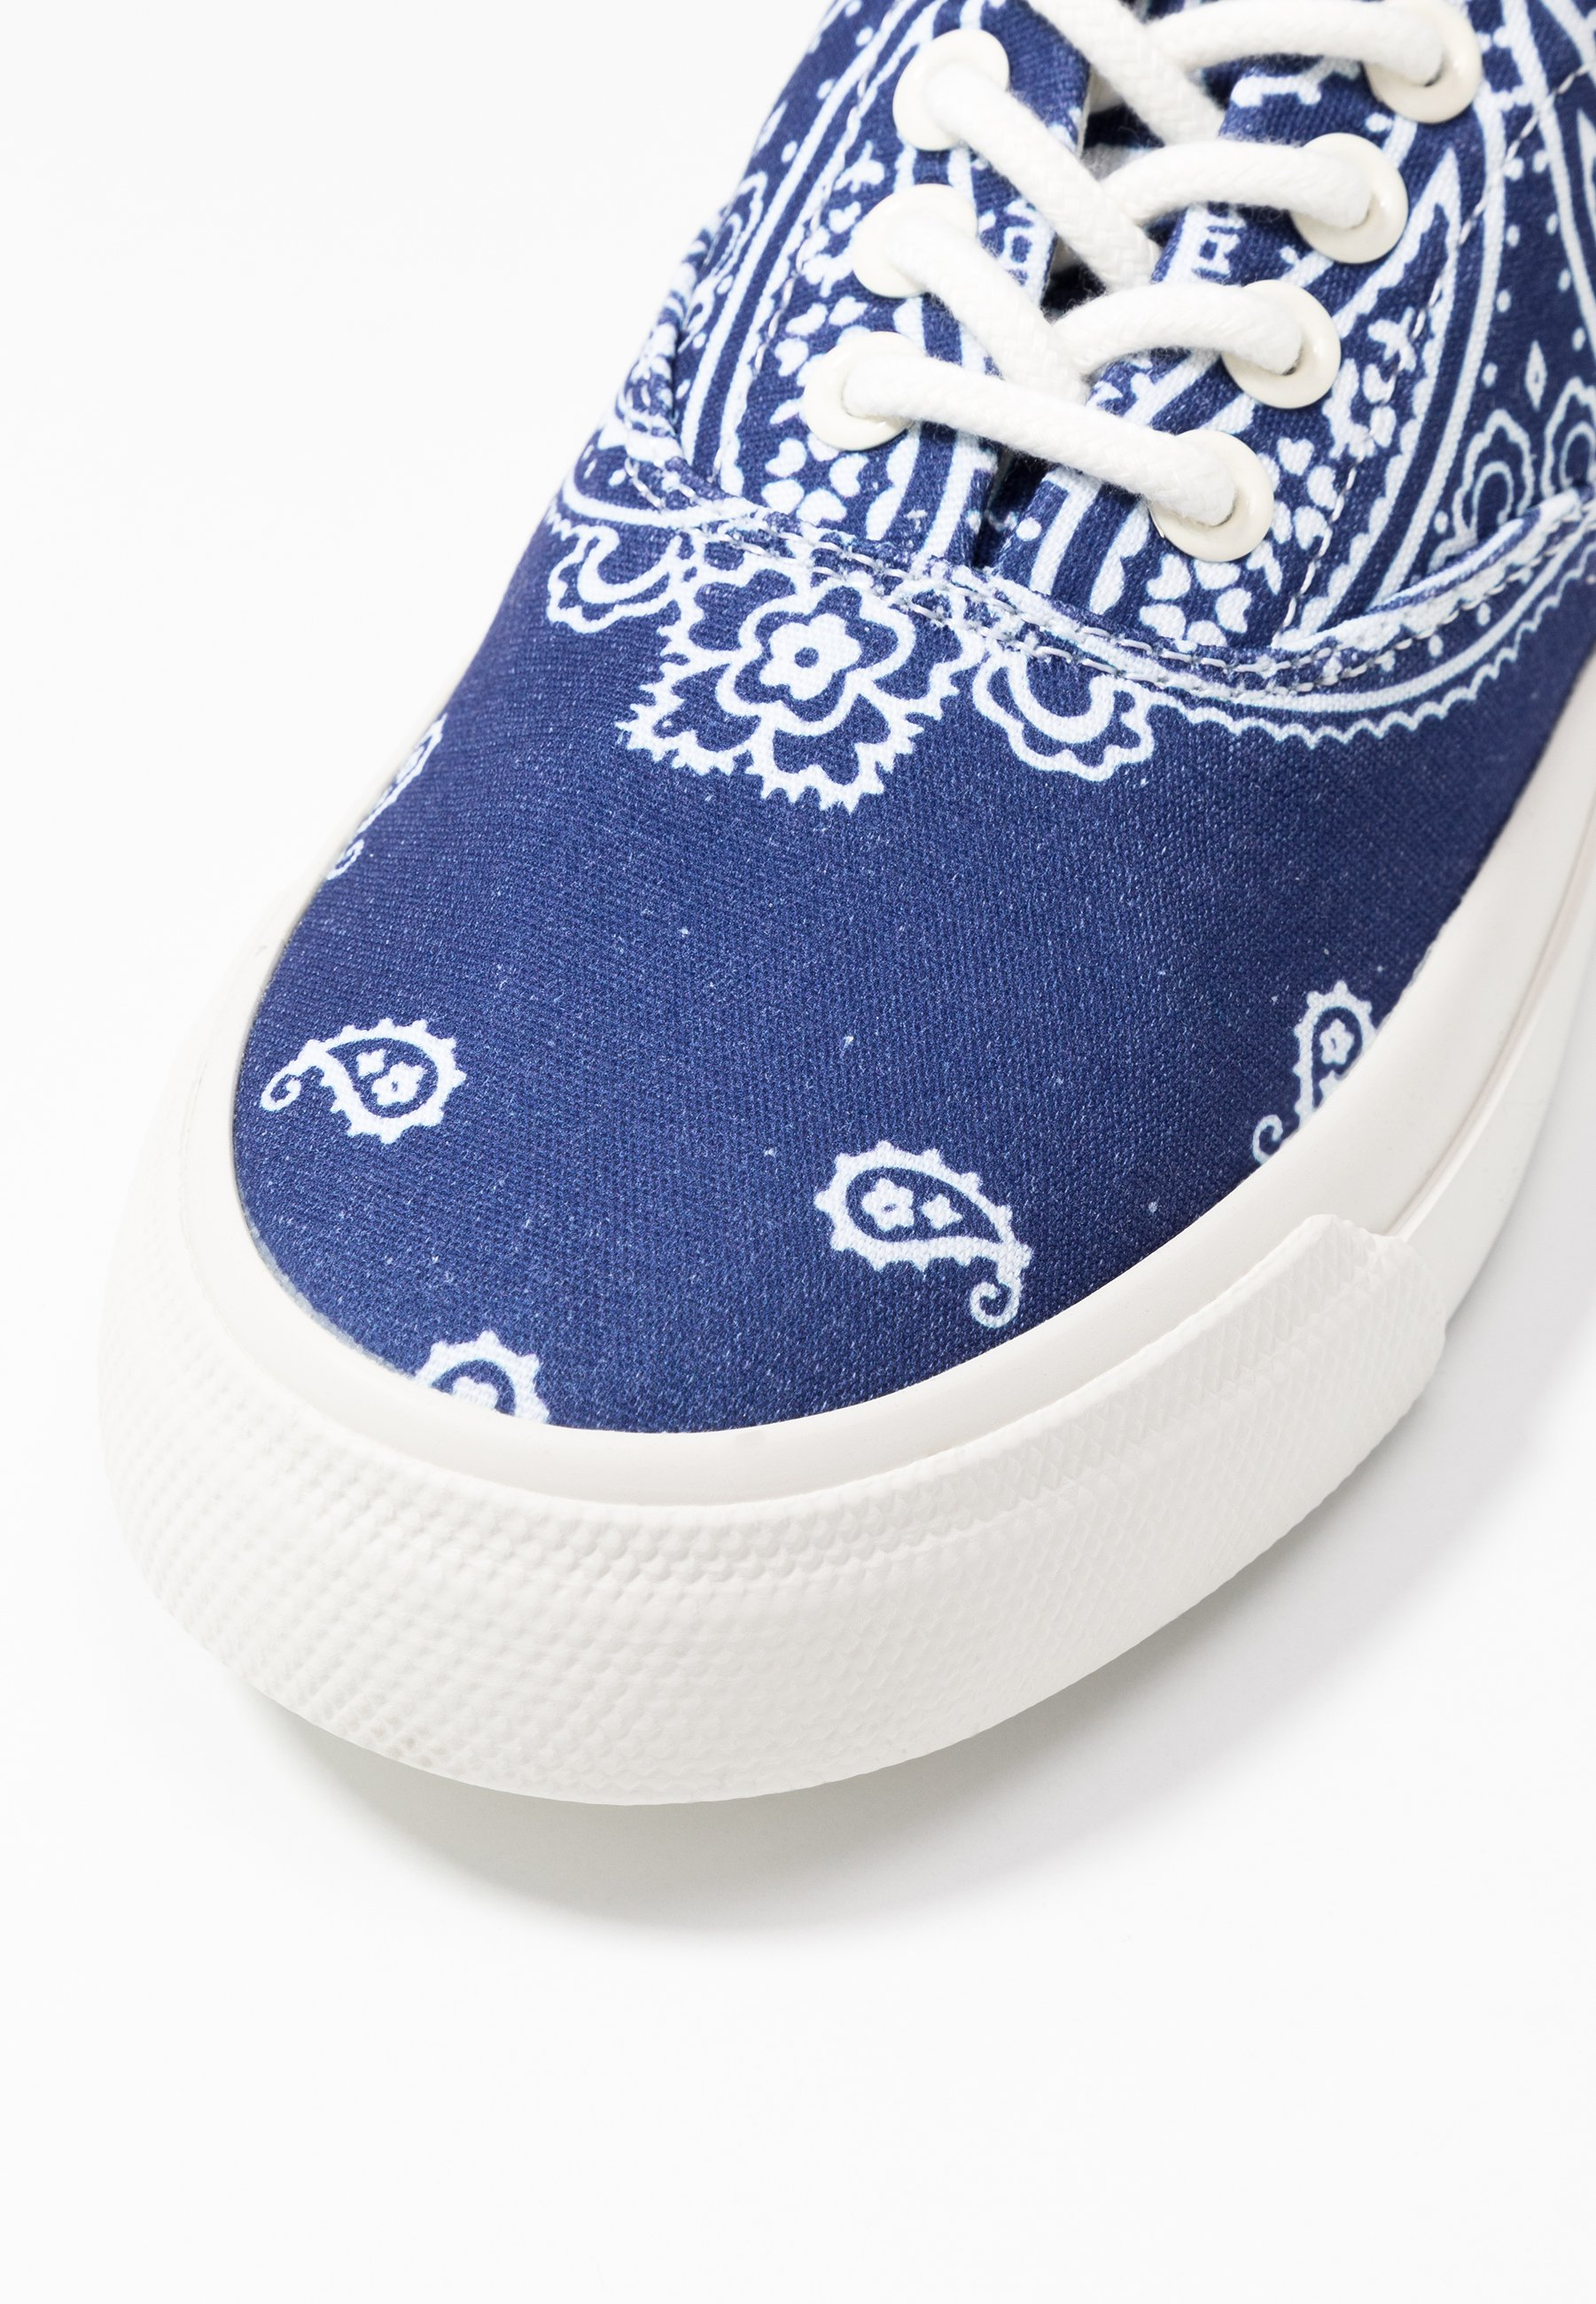 Polo Ralph Lauren BANDANA PRINT - Baskets basses - navy/white - Sneakers femme Excellent